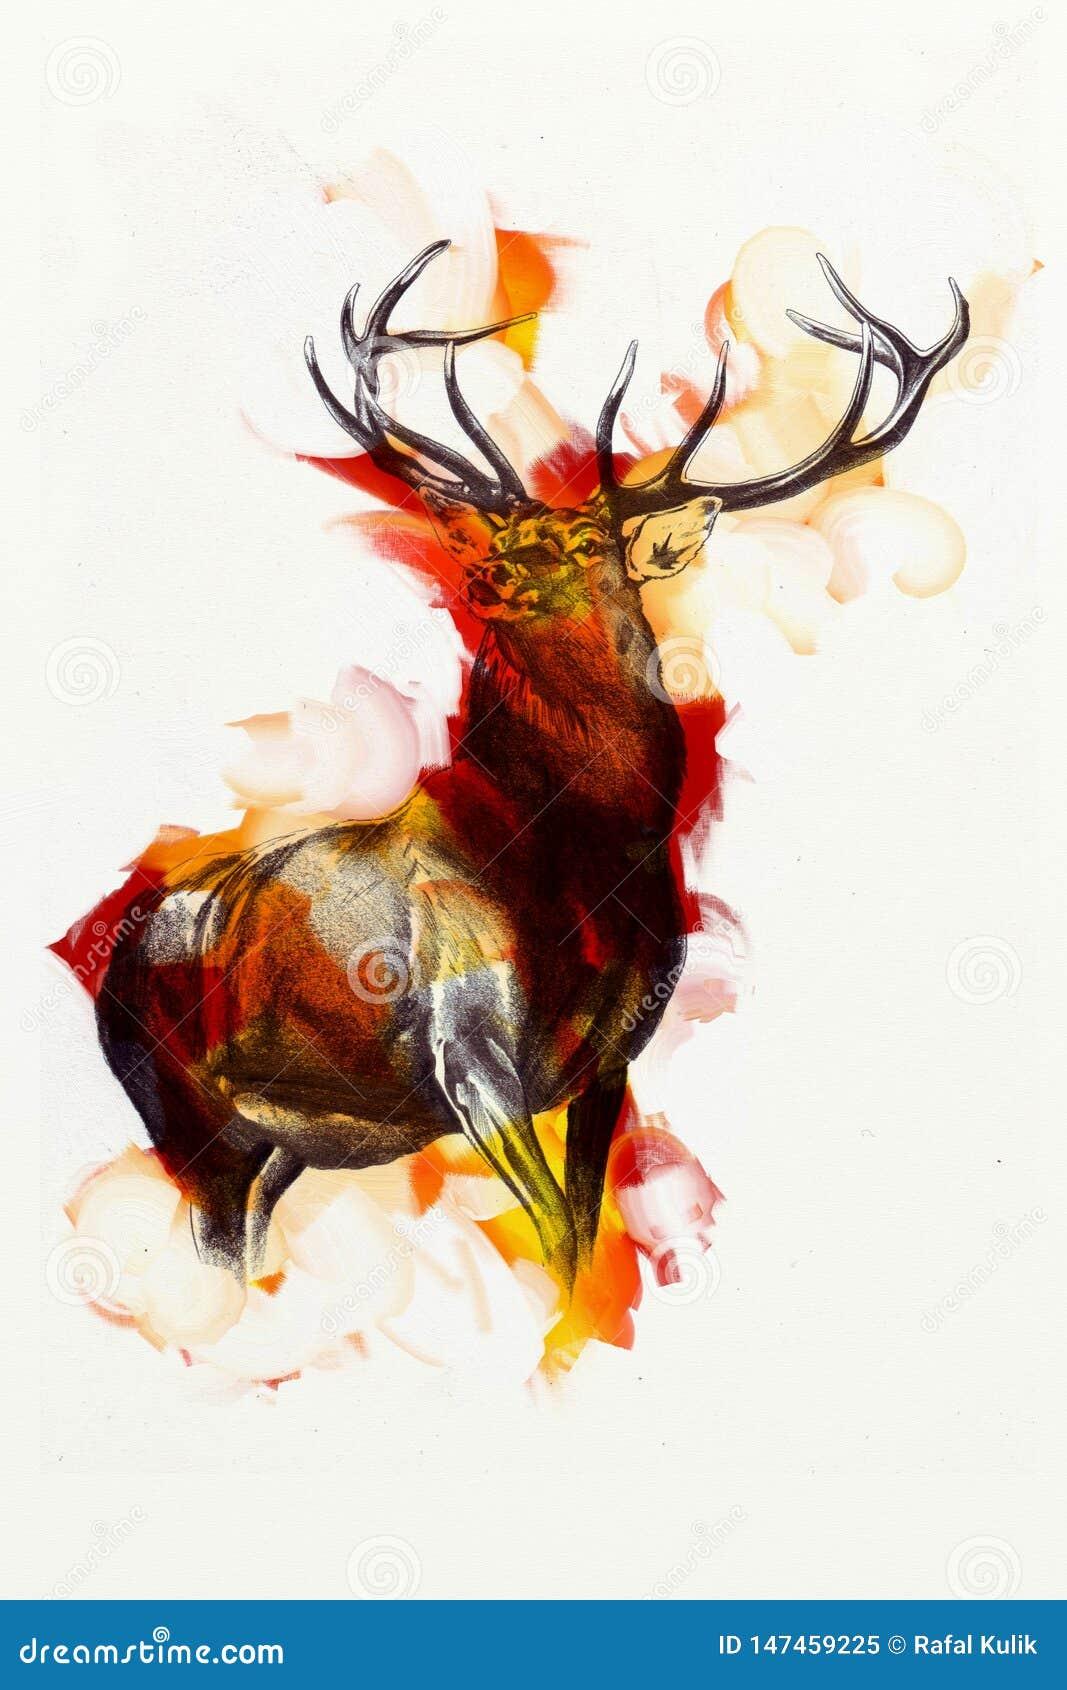 Antique Stag Art Drawing Handmade Nature Art Artwork Stock Illustration Illustration Of Head Field 147459225